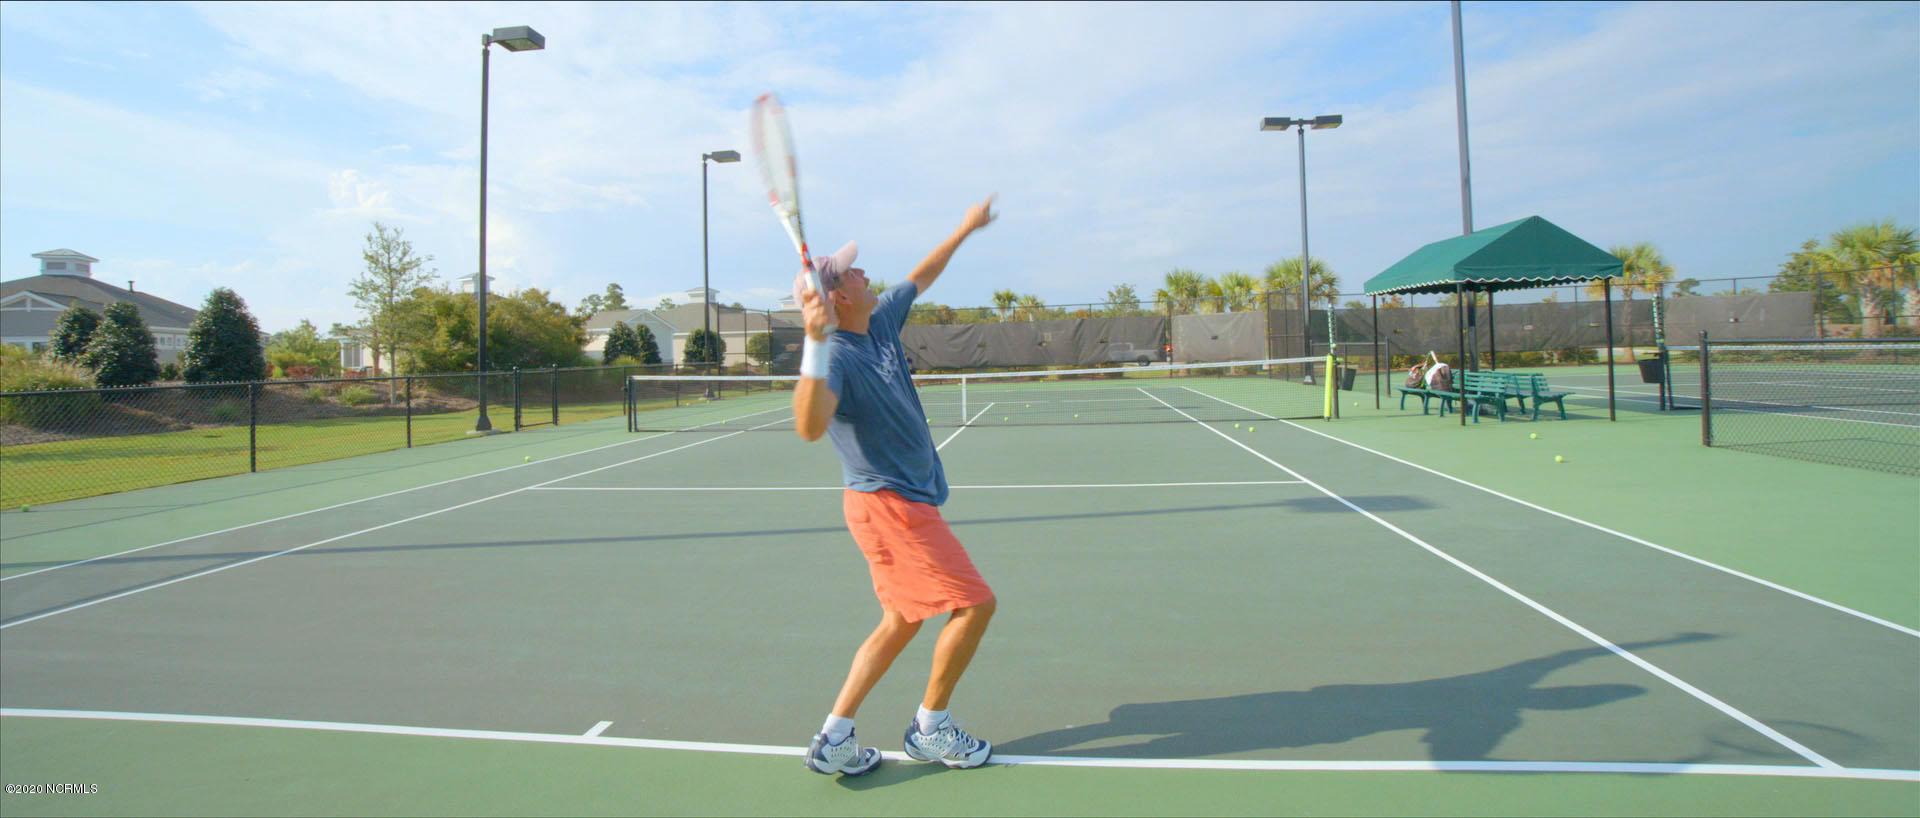 11-Tennis